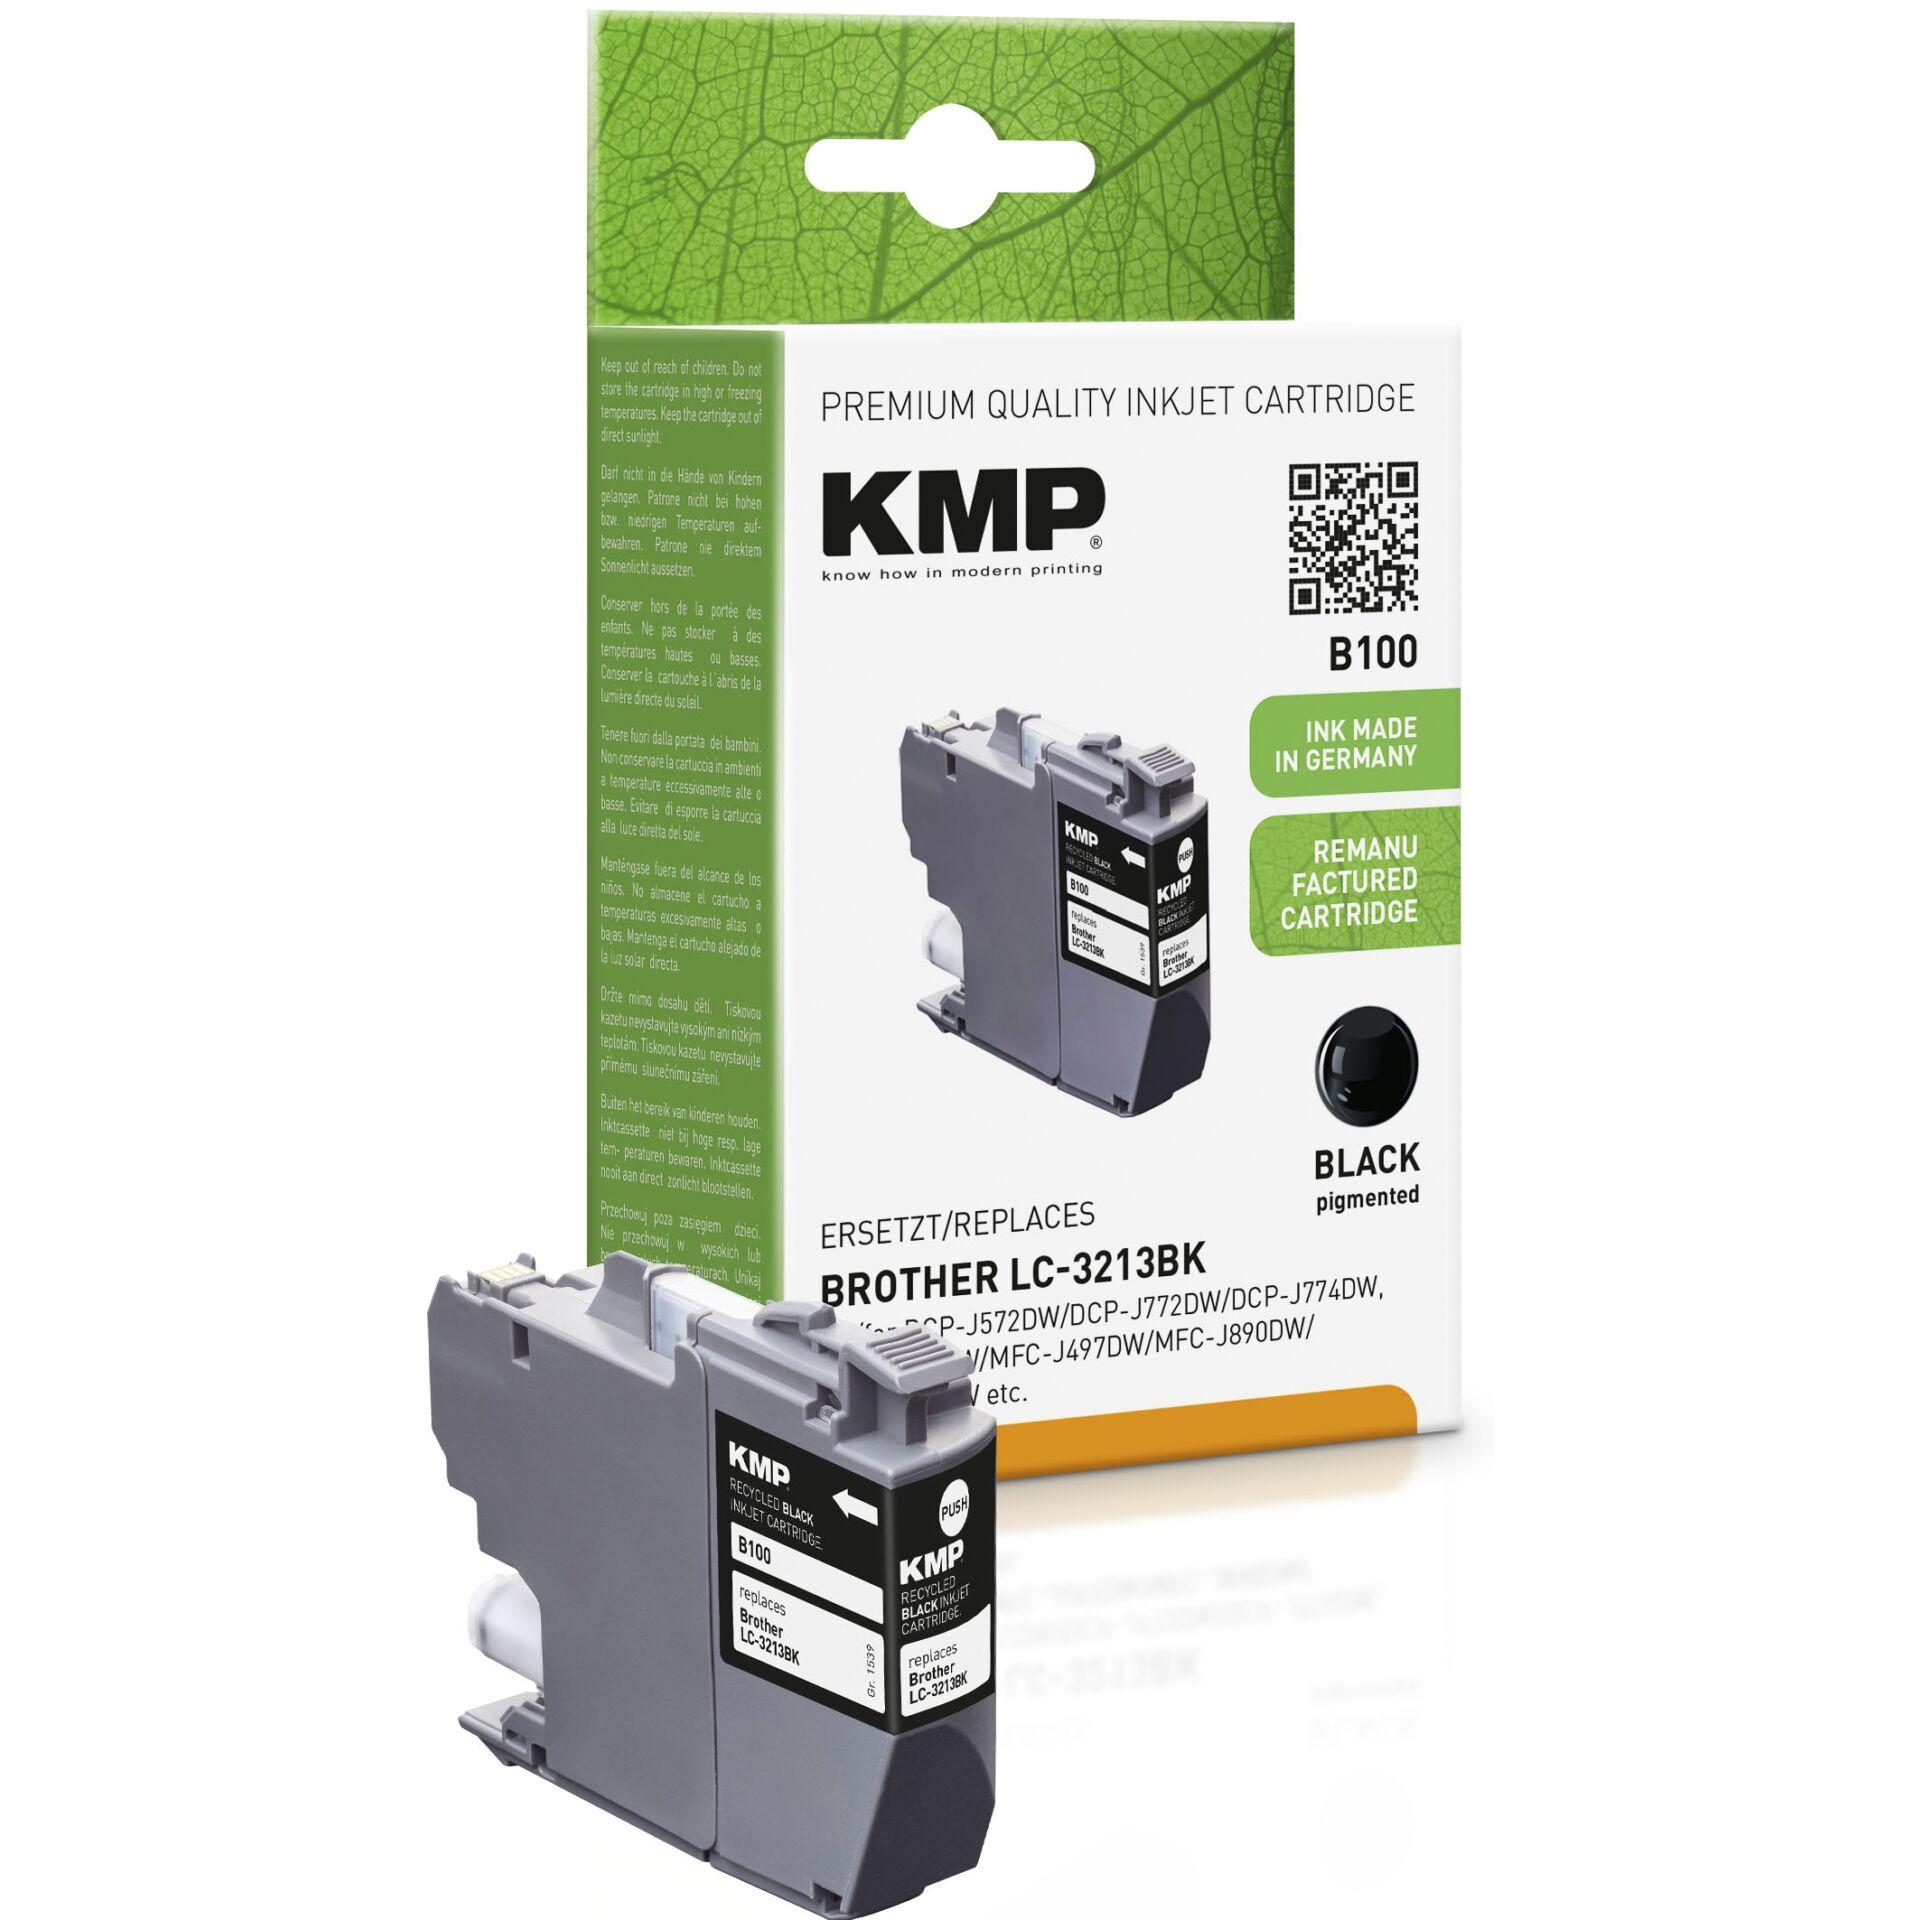 KMP B100 ink cartridge black for Brother LC-3213BK